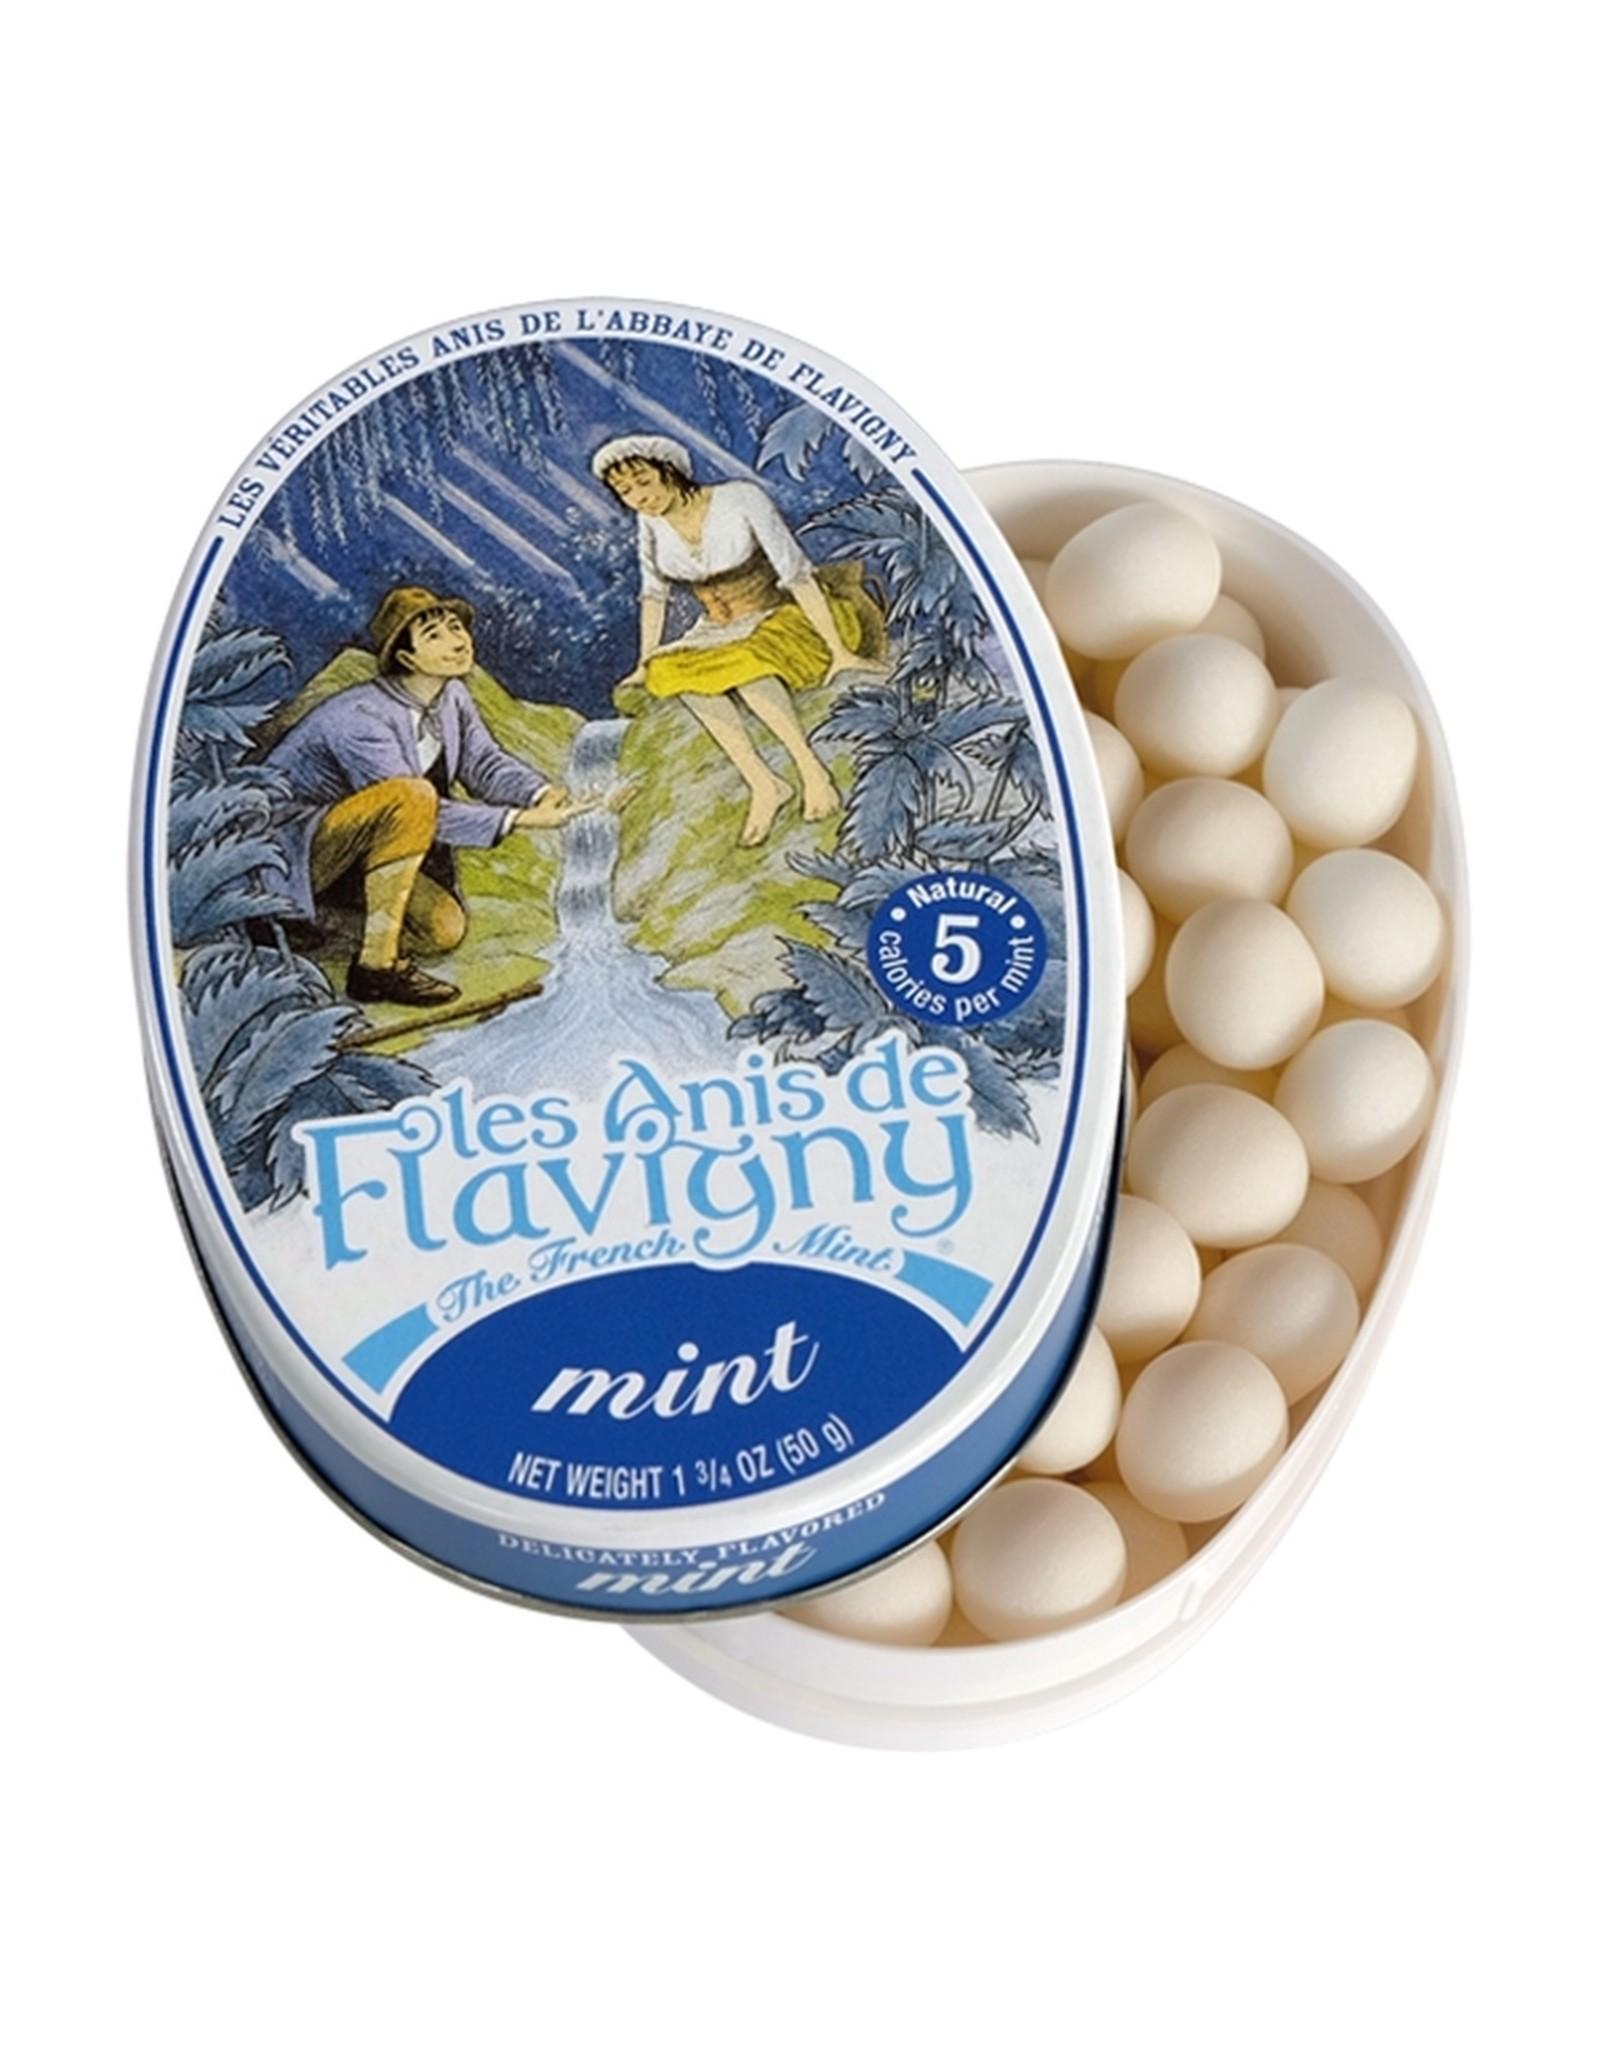 Les Anis Flavigny Les Anis Flavigny Mint Tin (Mint)